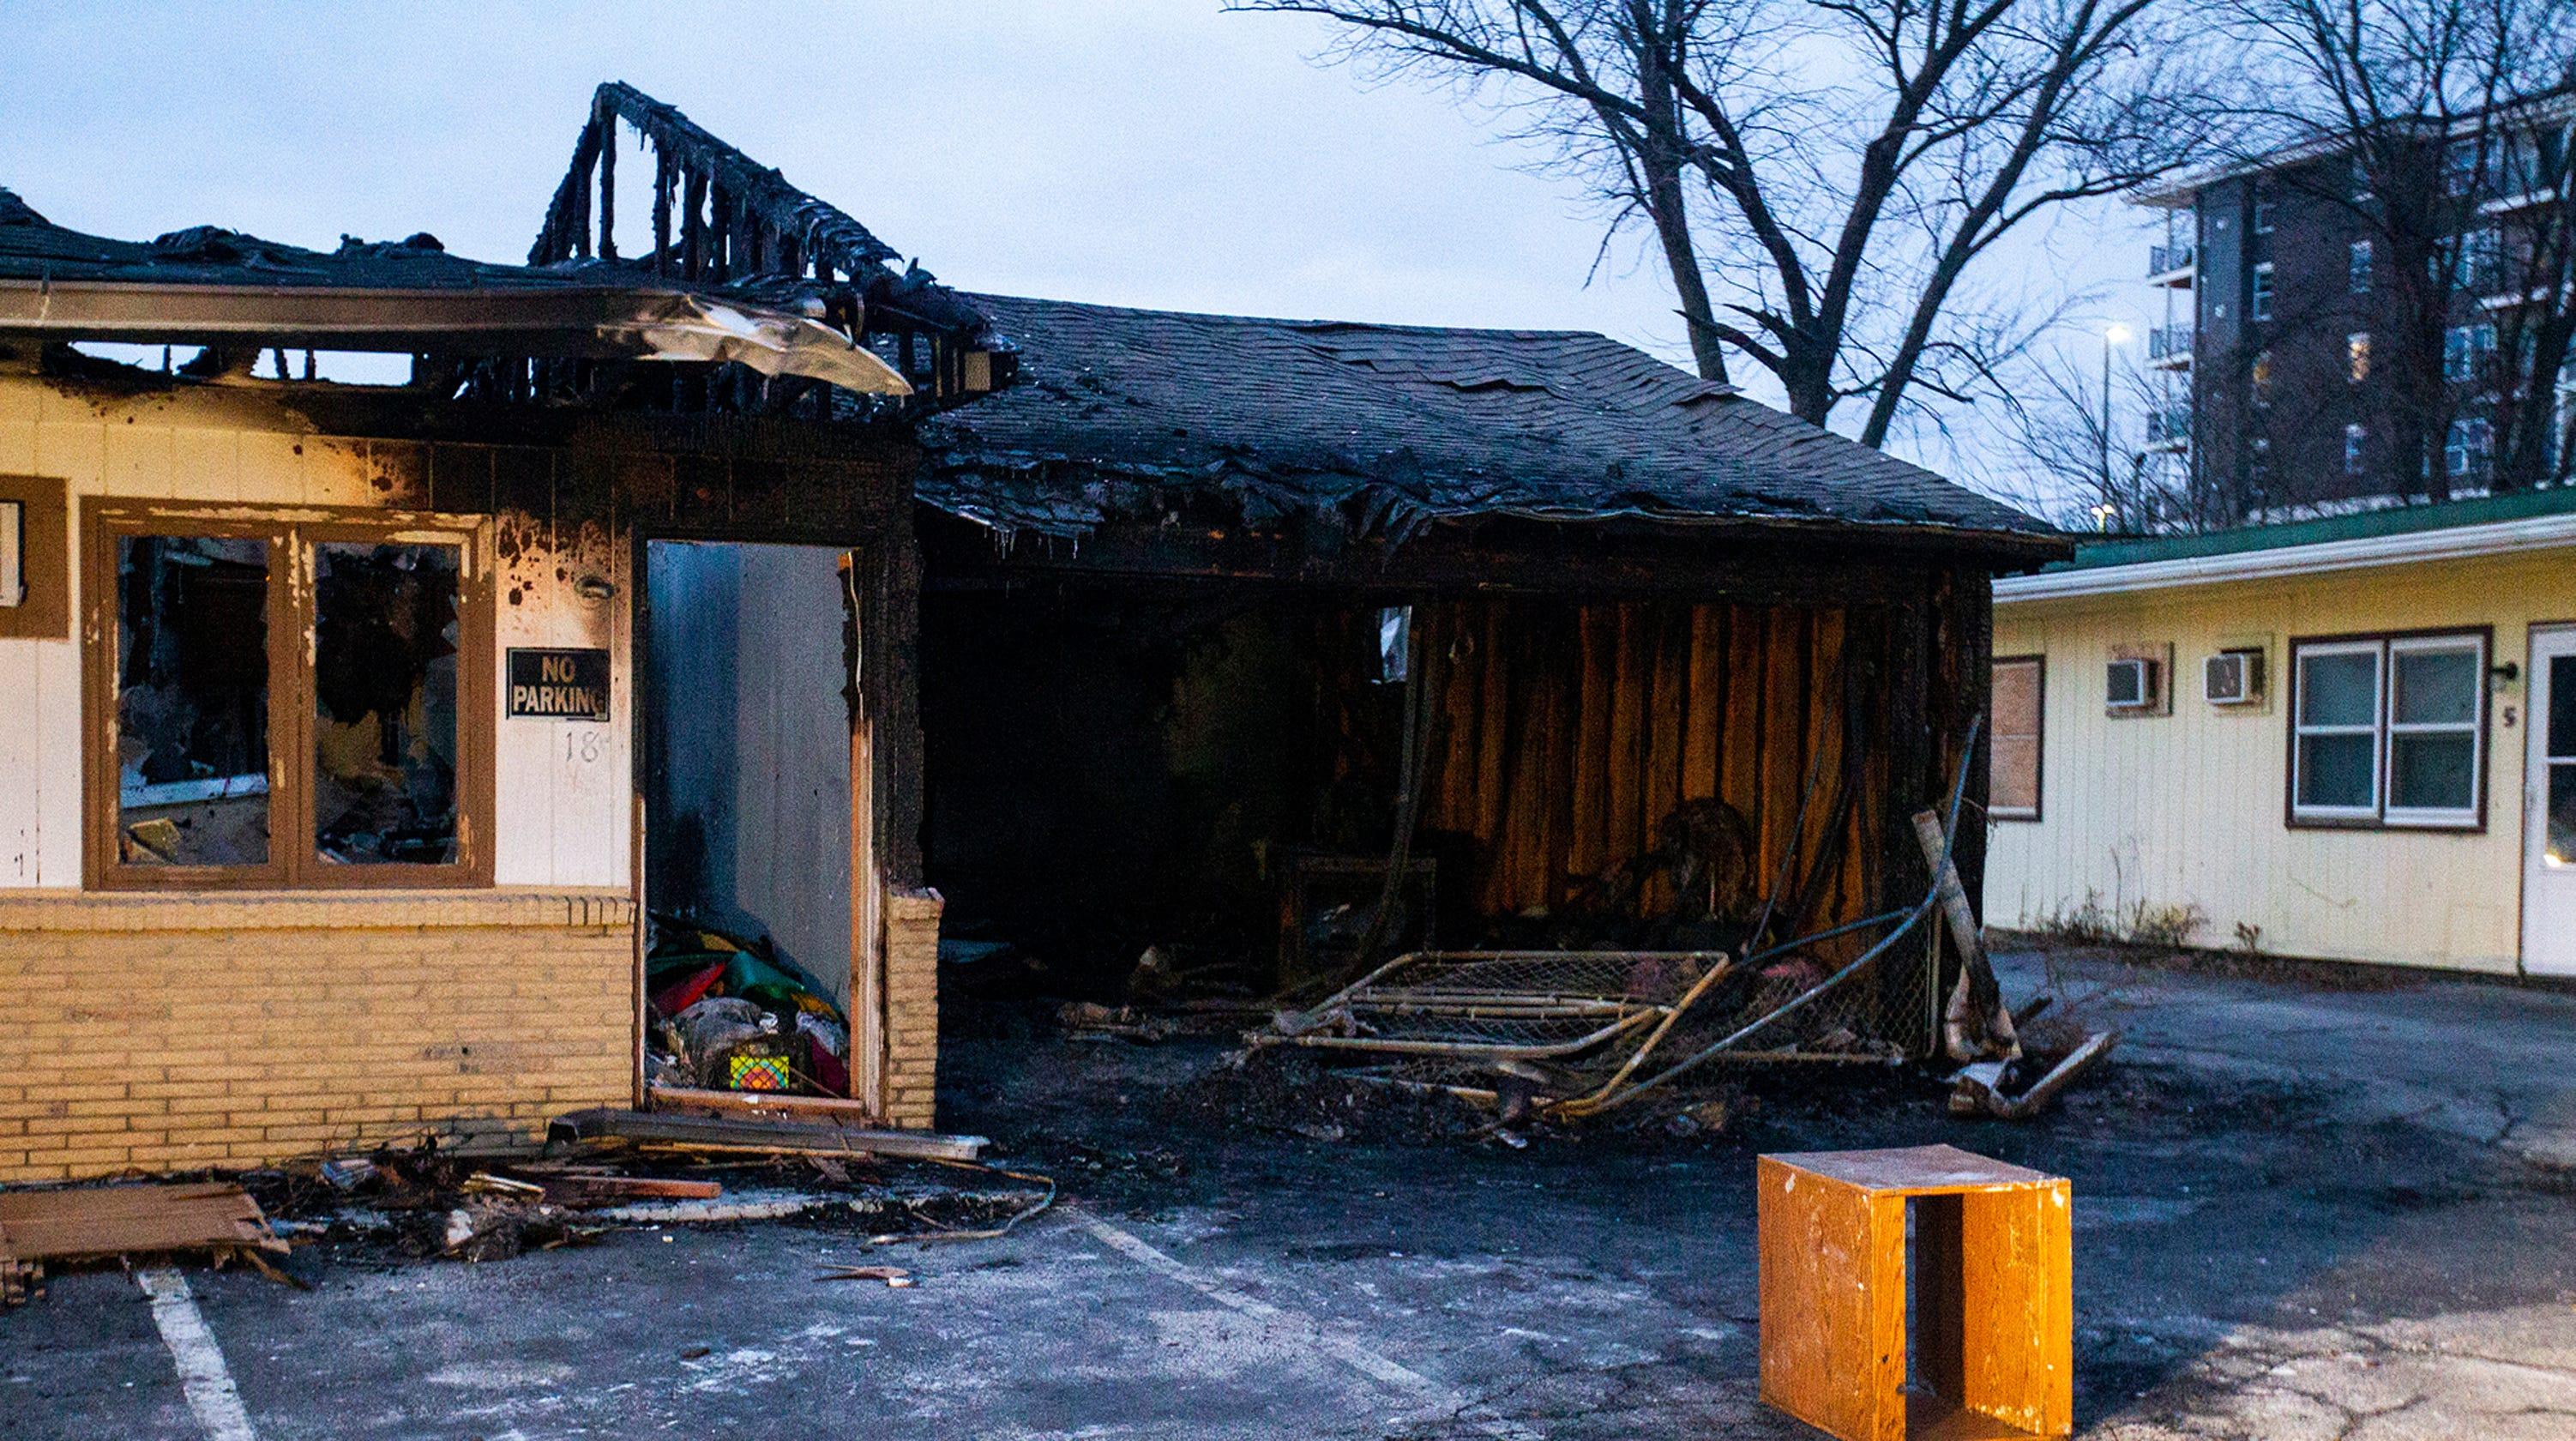 photos coralville capri lodge motel fire. Black Bedroom Furniture Sets. Home Design Ideas